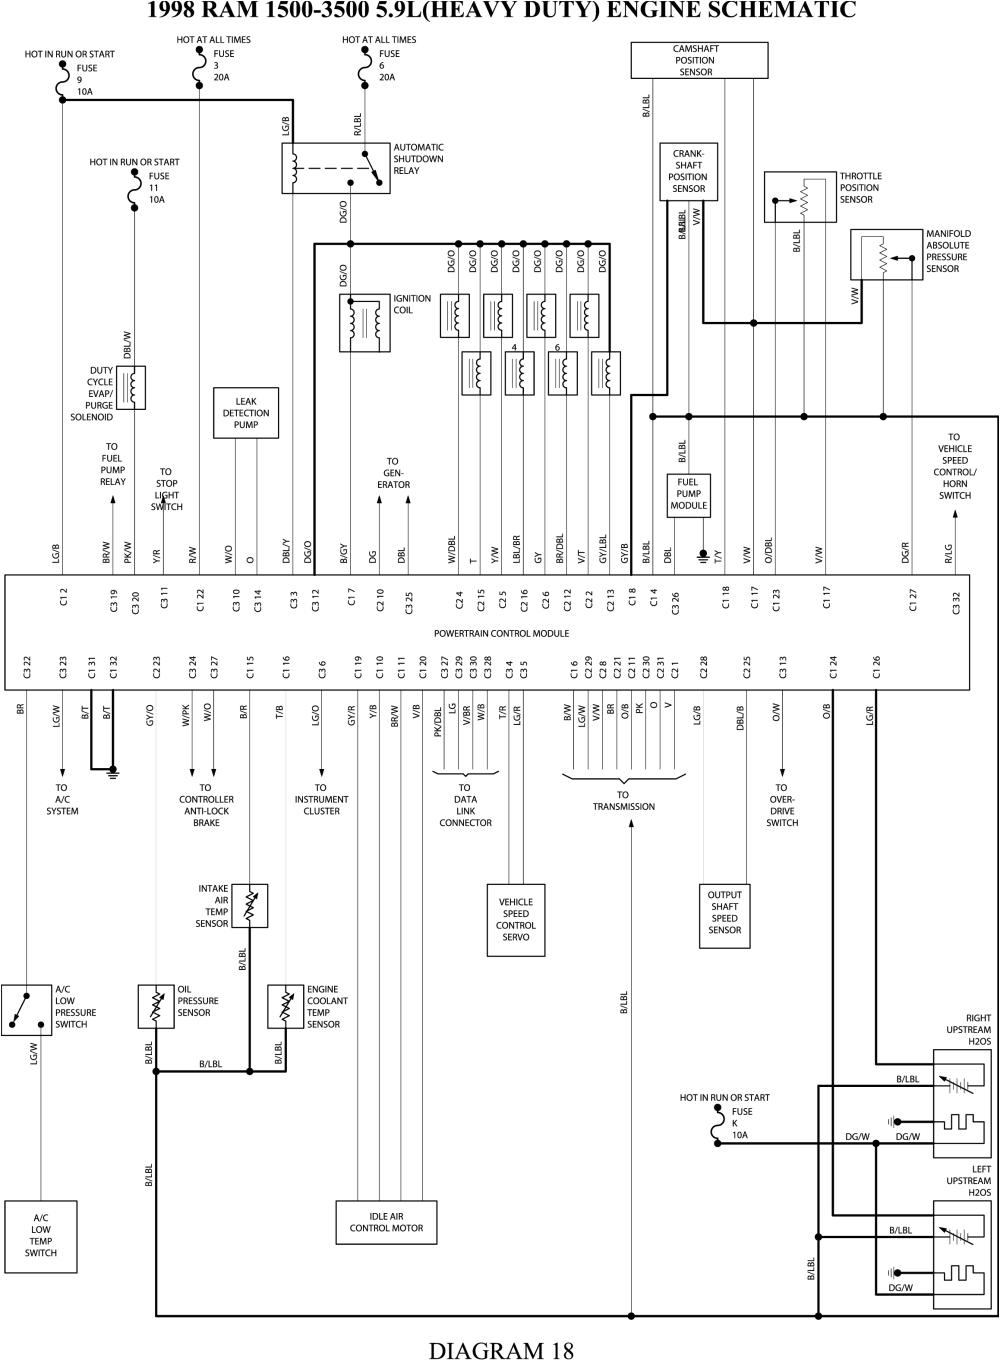 98 Dodge Durango Wiring Diagram 2000 Dodge Ram Engine Wire Diagram Schema Wiring Diagram